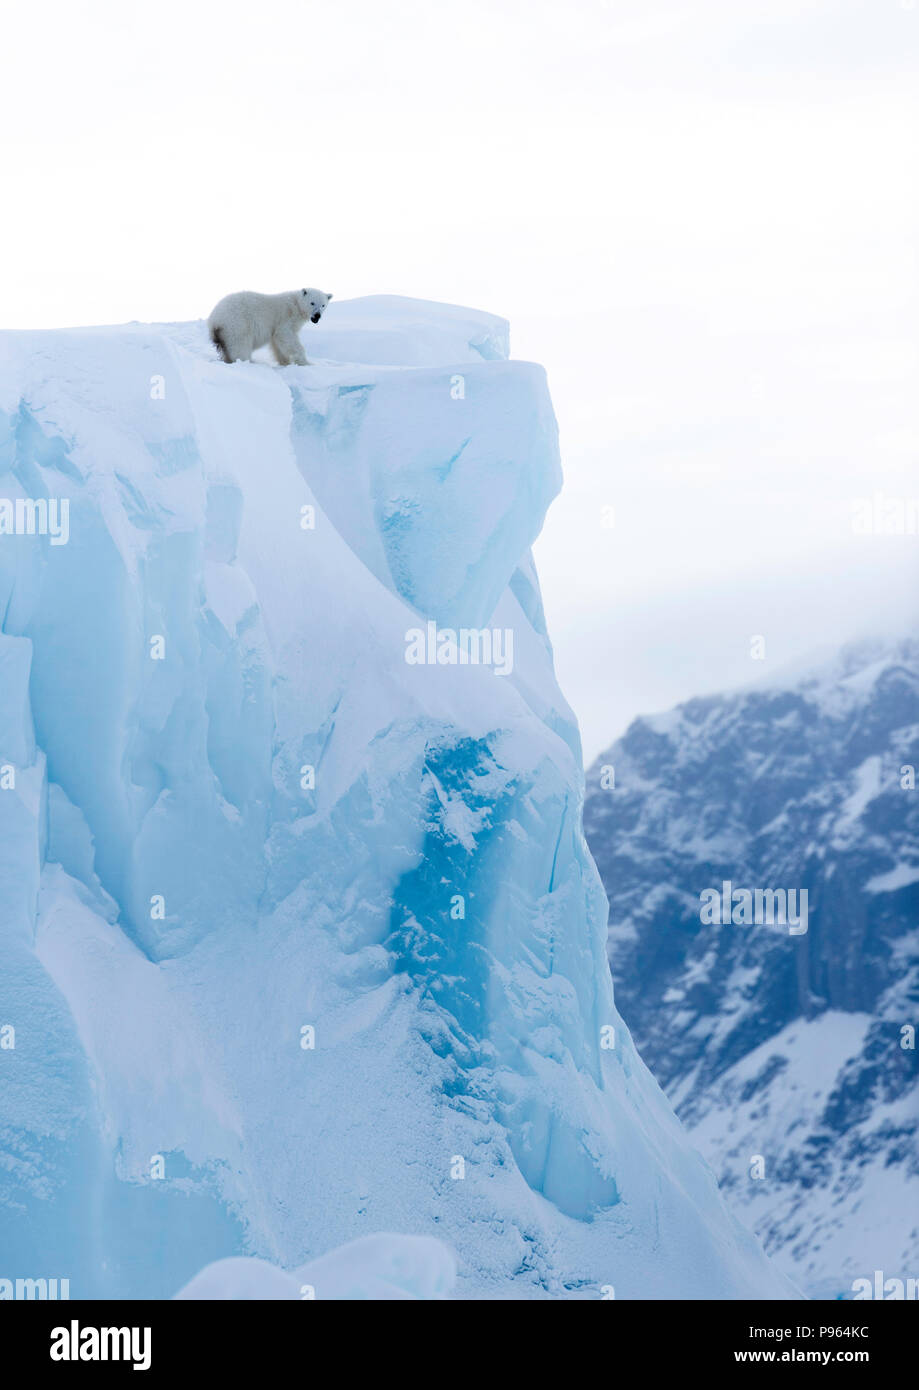 Polar bear cub looking down the face of an iceberg, Baffin Island, spring 2018. - Stock Image